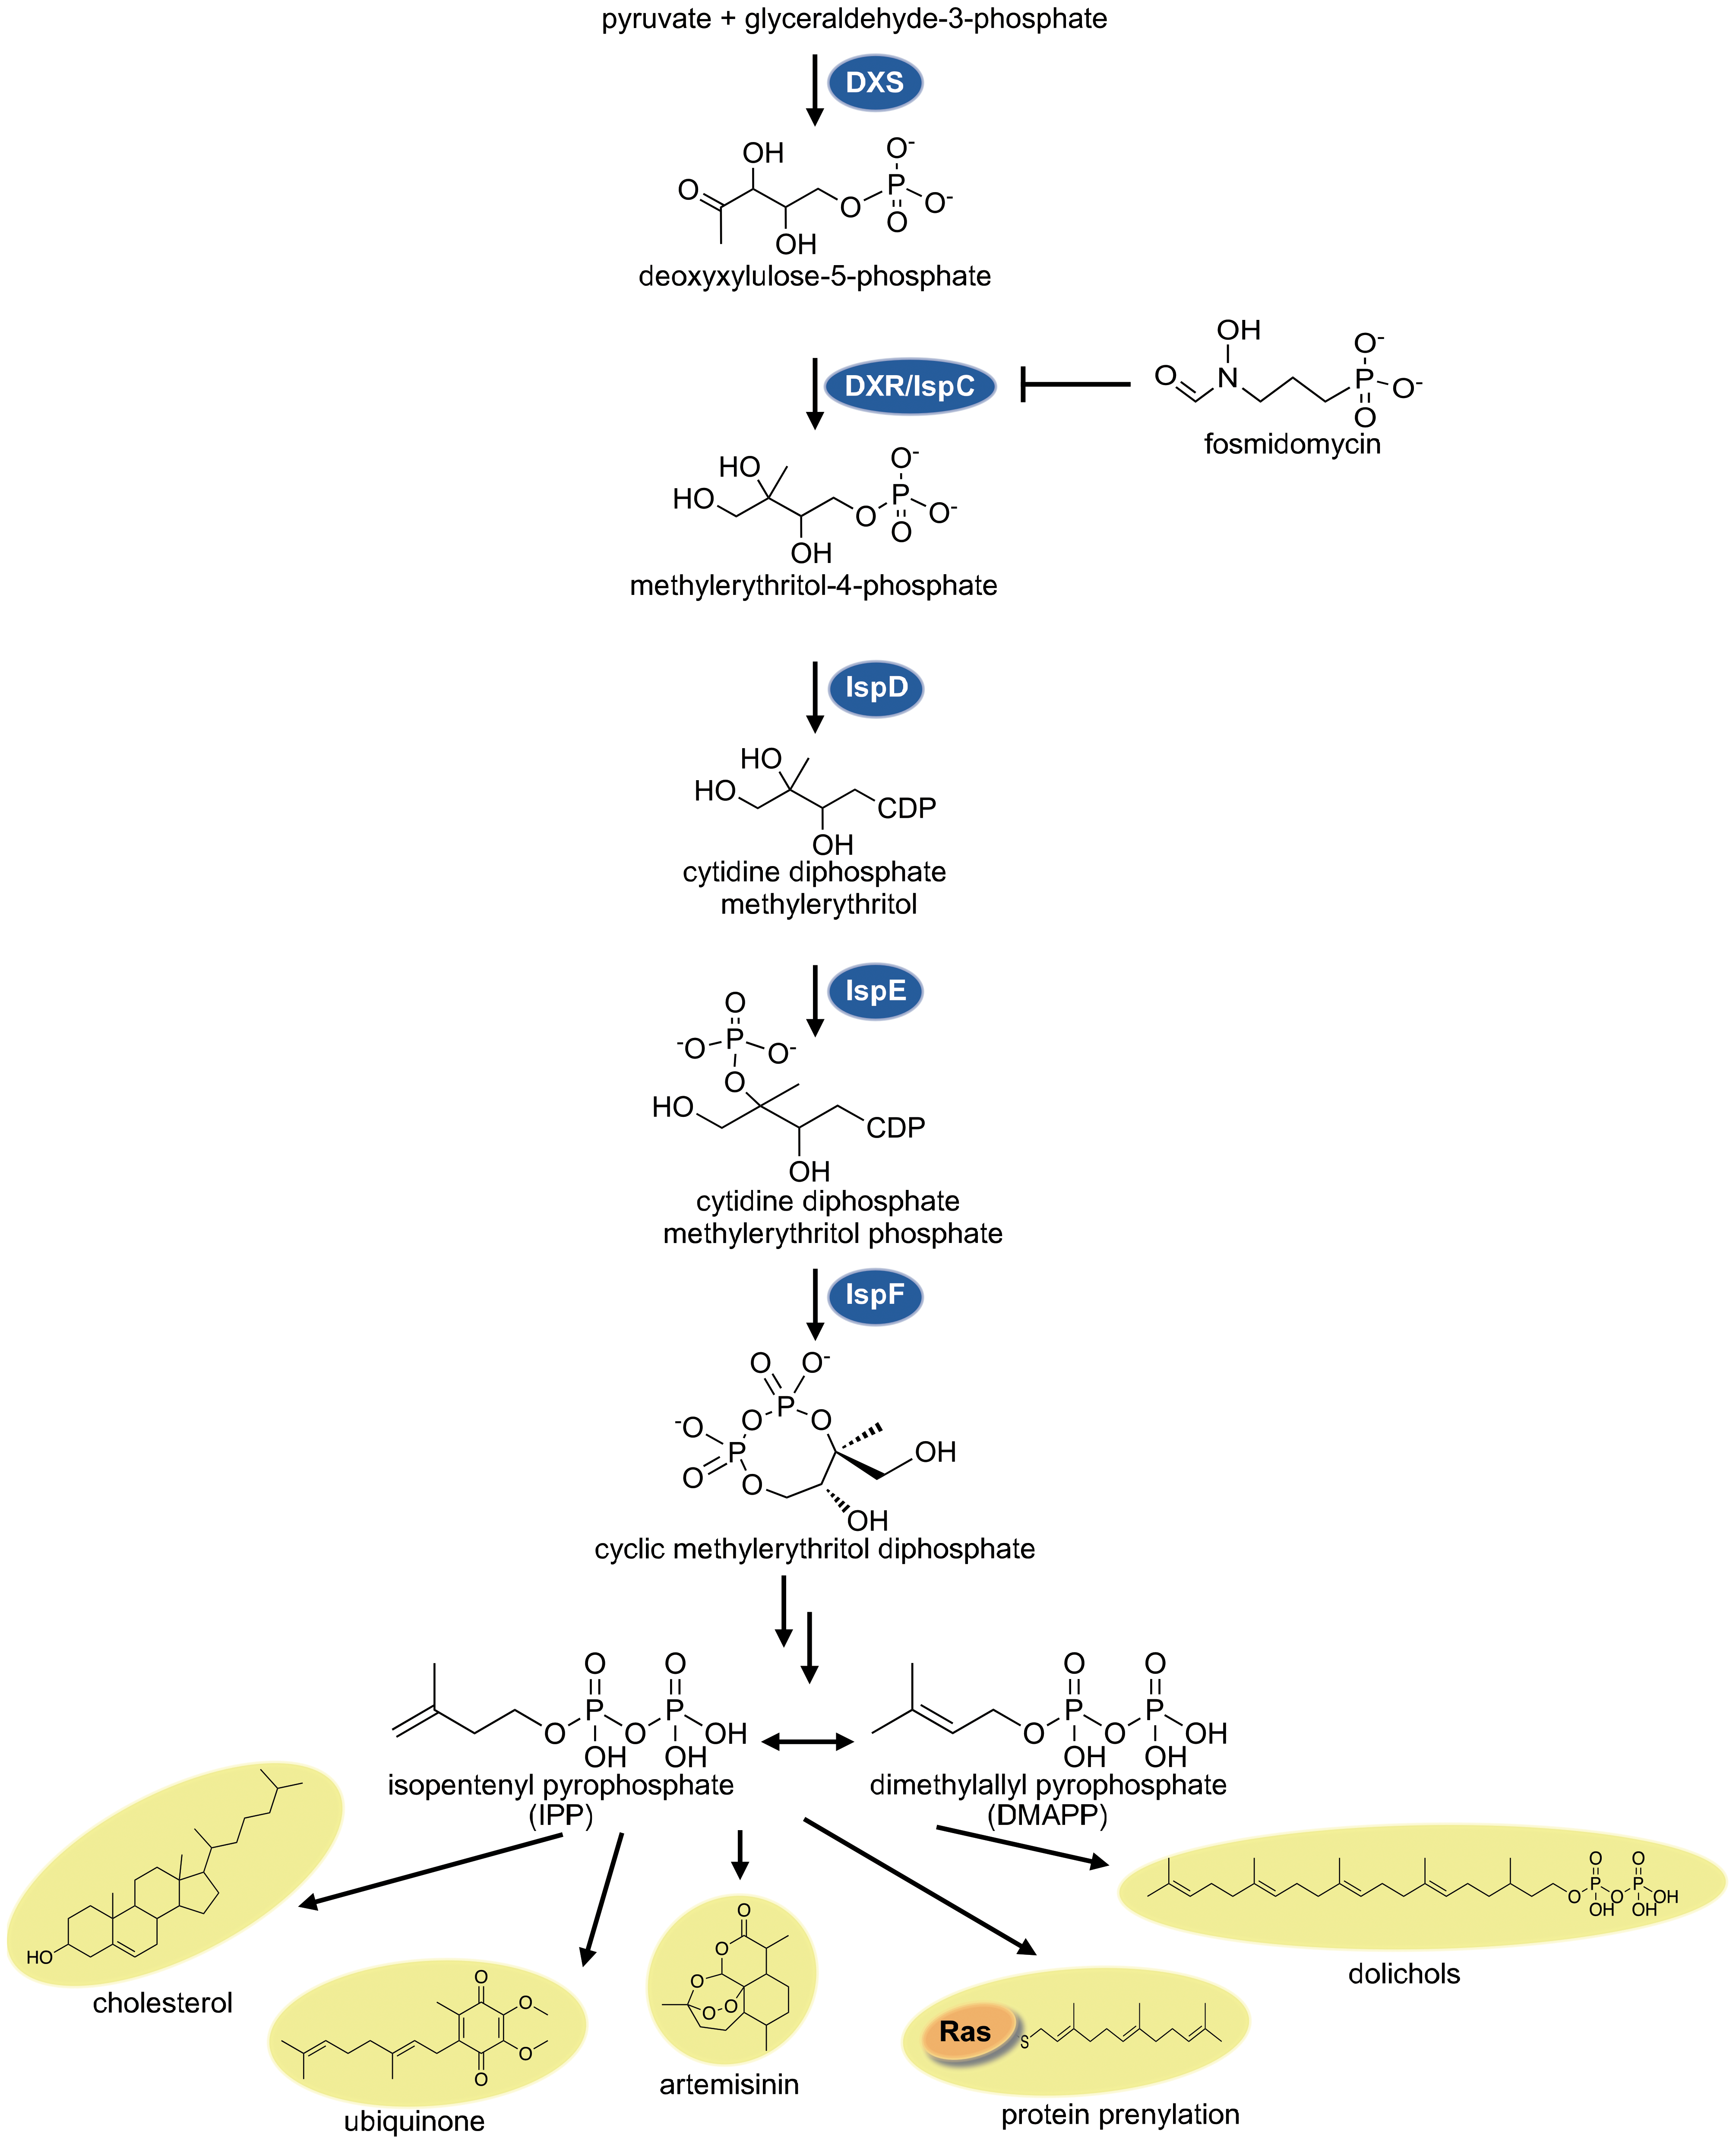 The non-mevalonate MEP pathway of isoprenoid biosynthesis.